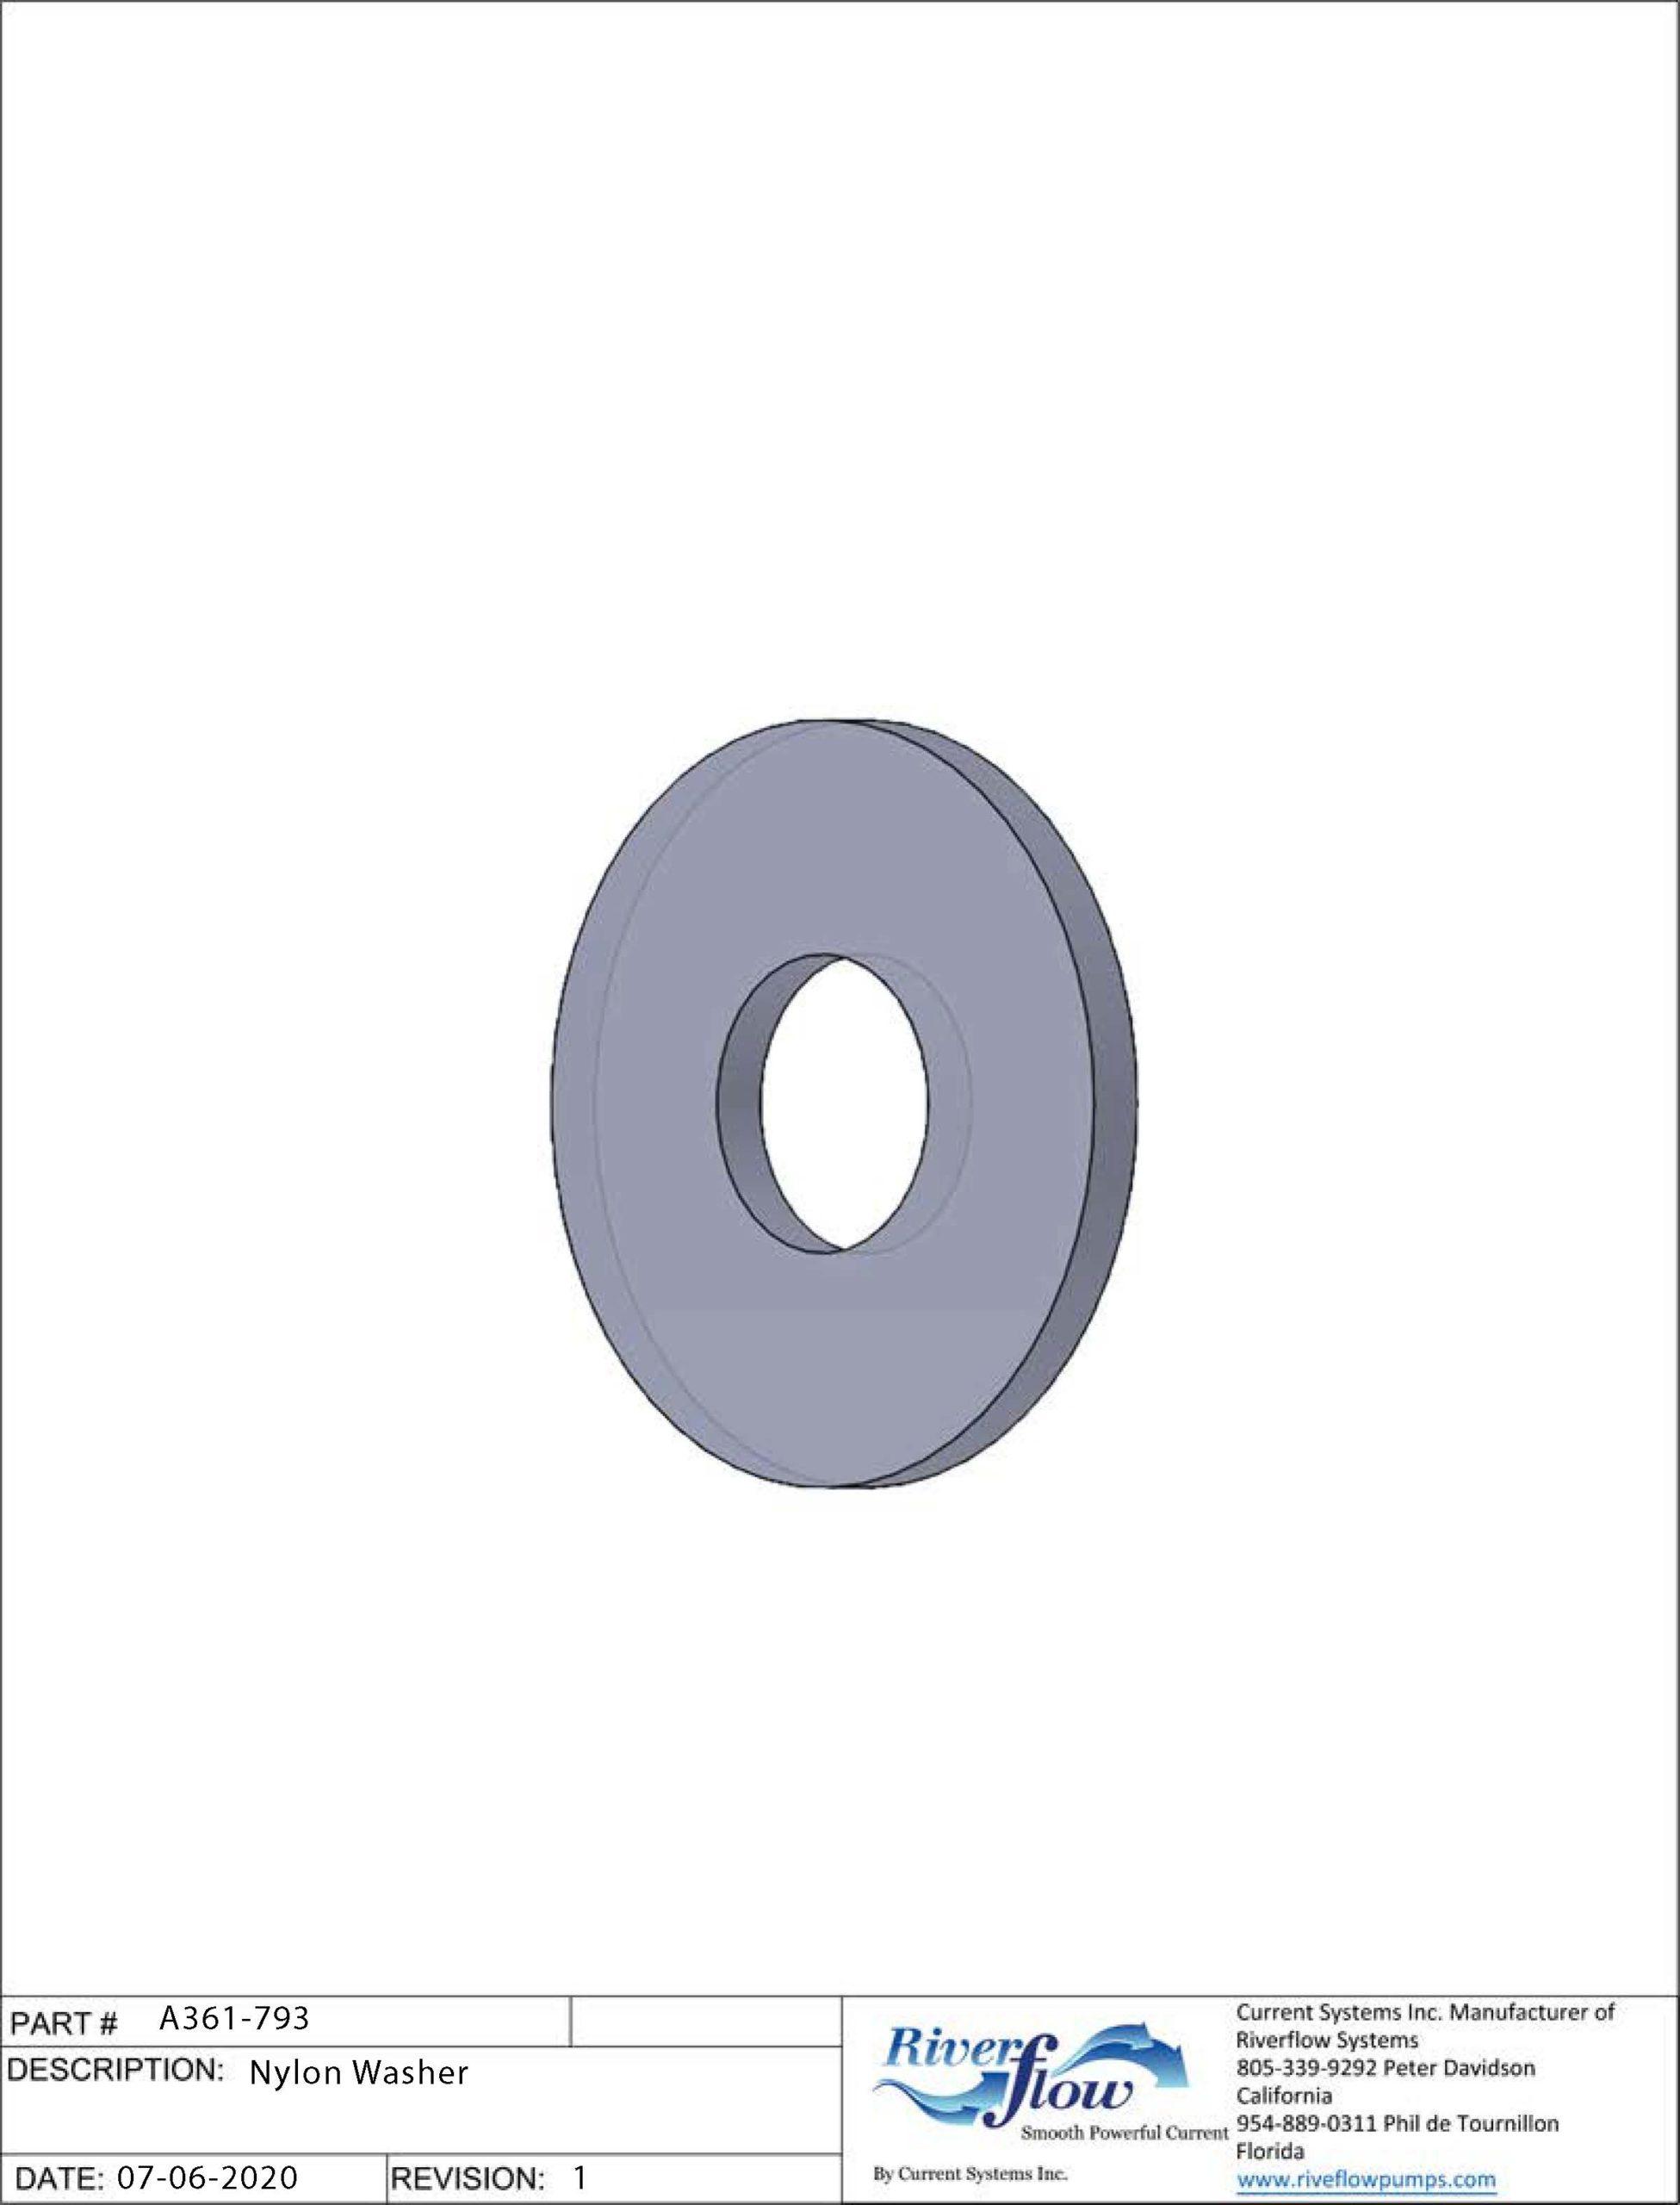 PPN#: A361-793  Nylon Washer